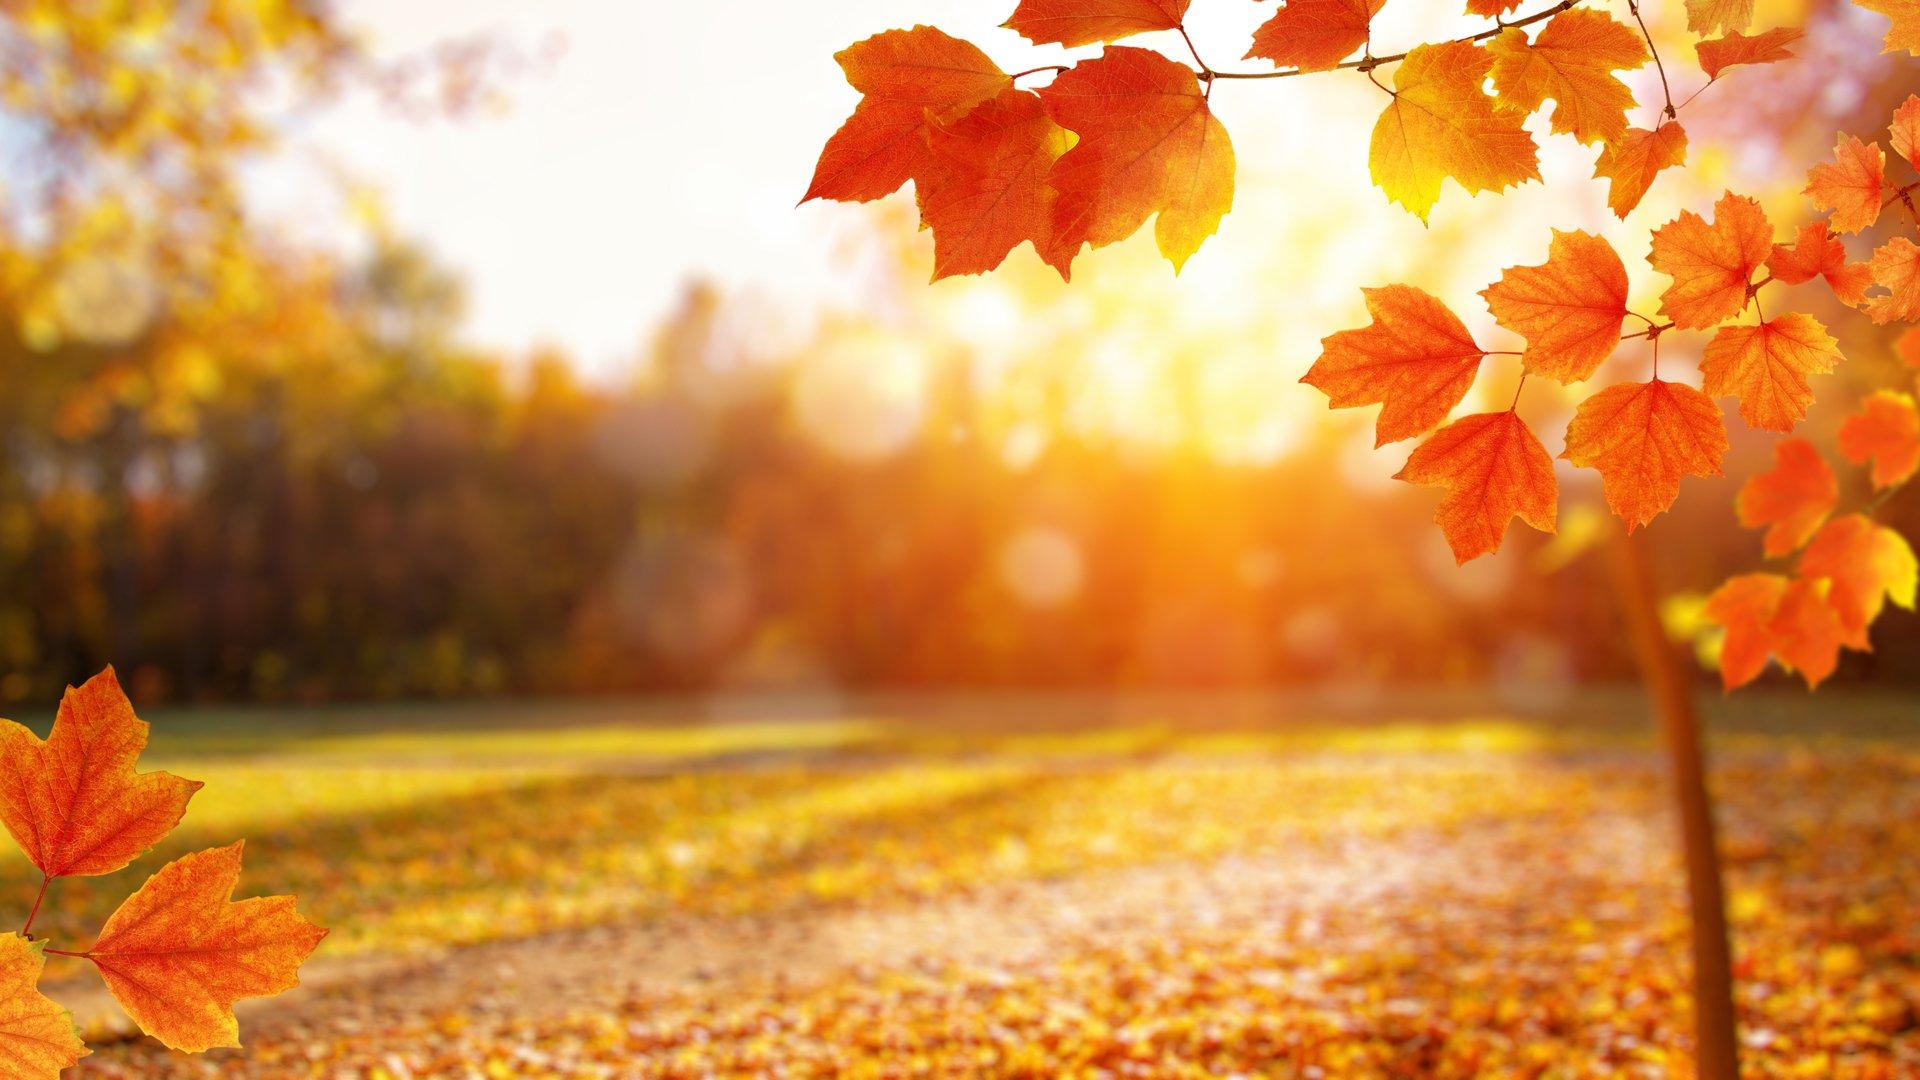 Fall Leaves at Sunrise